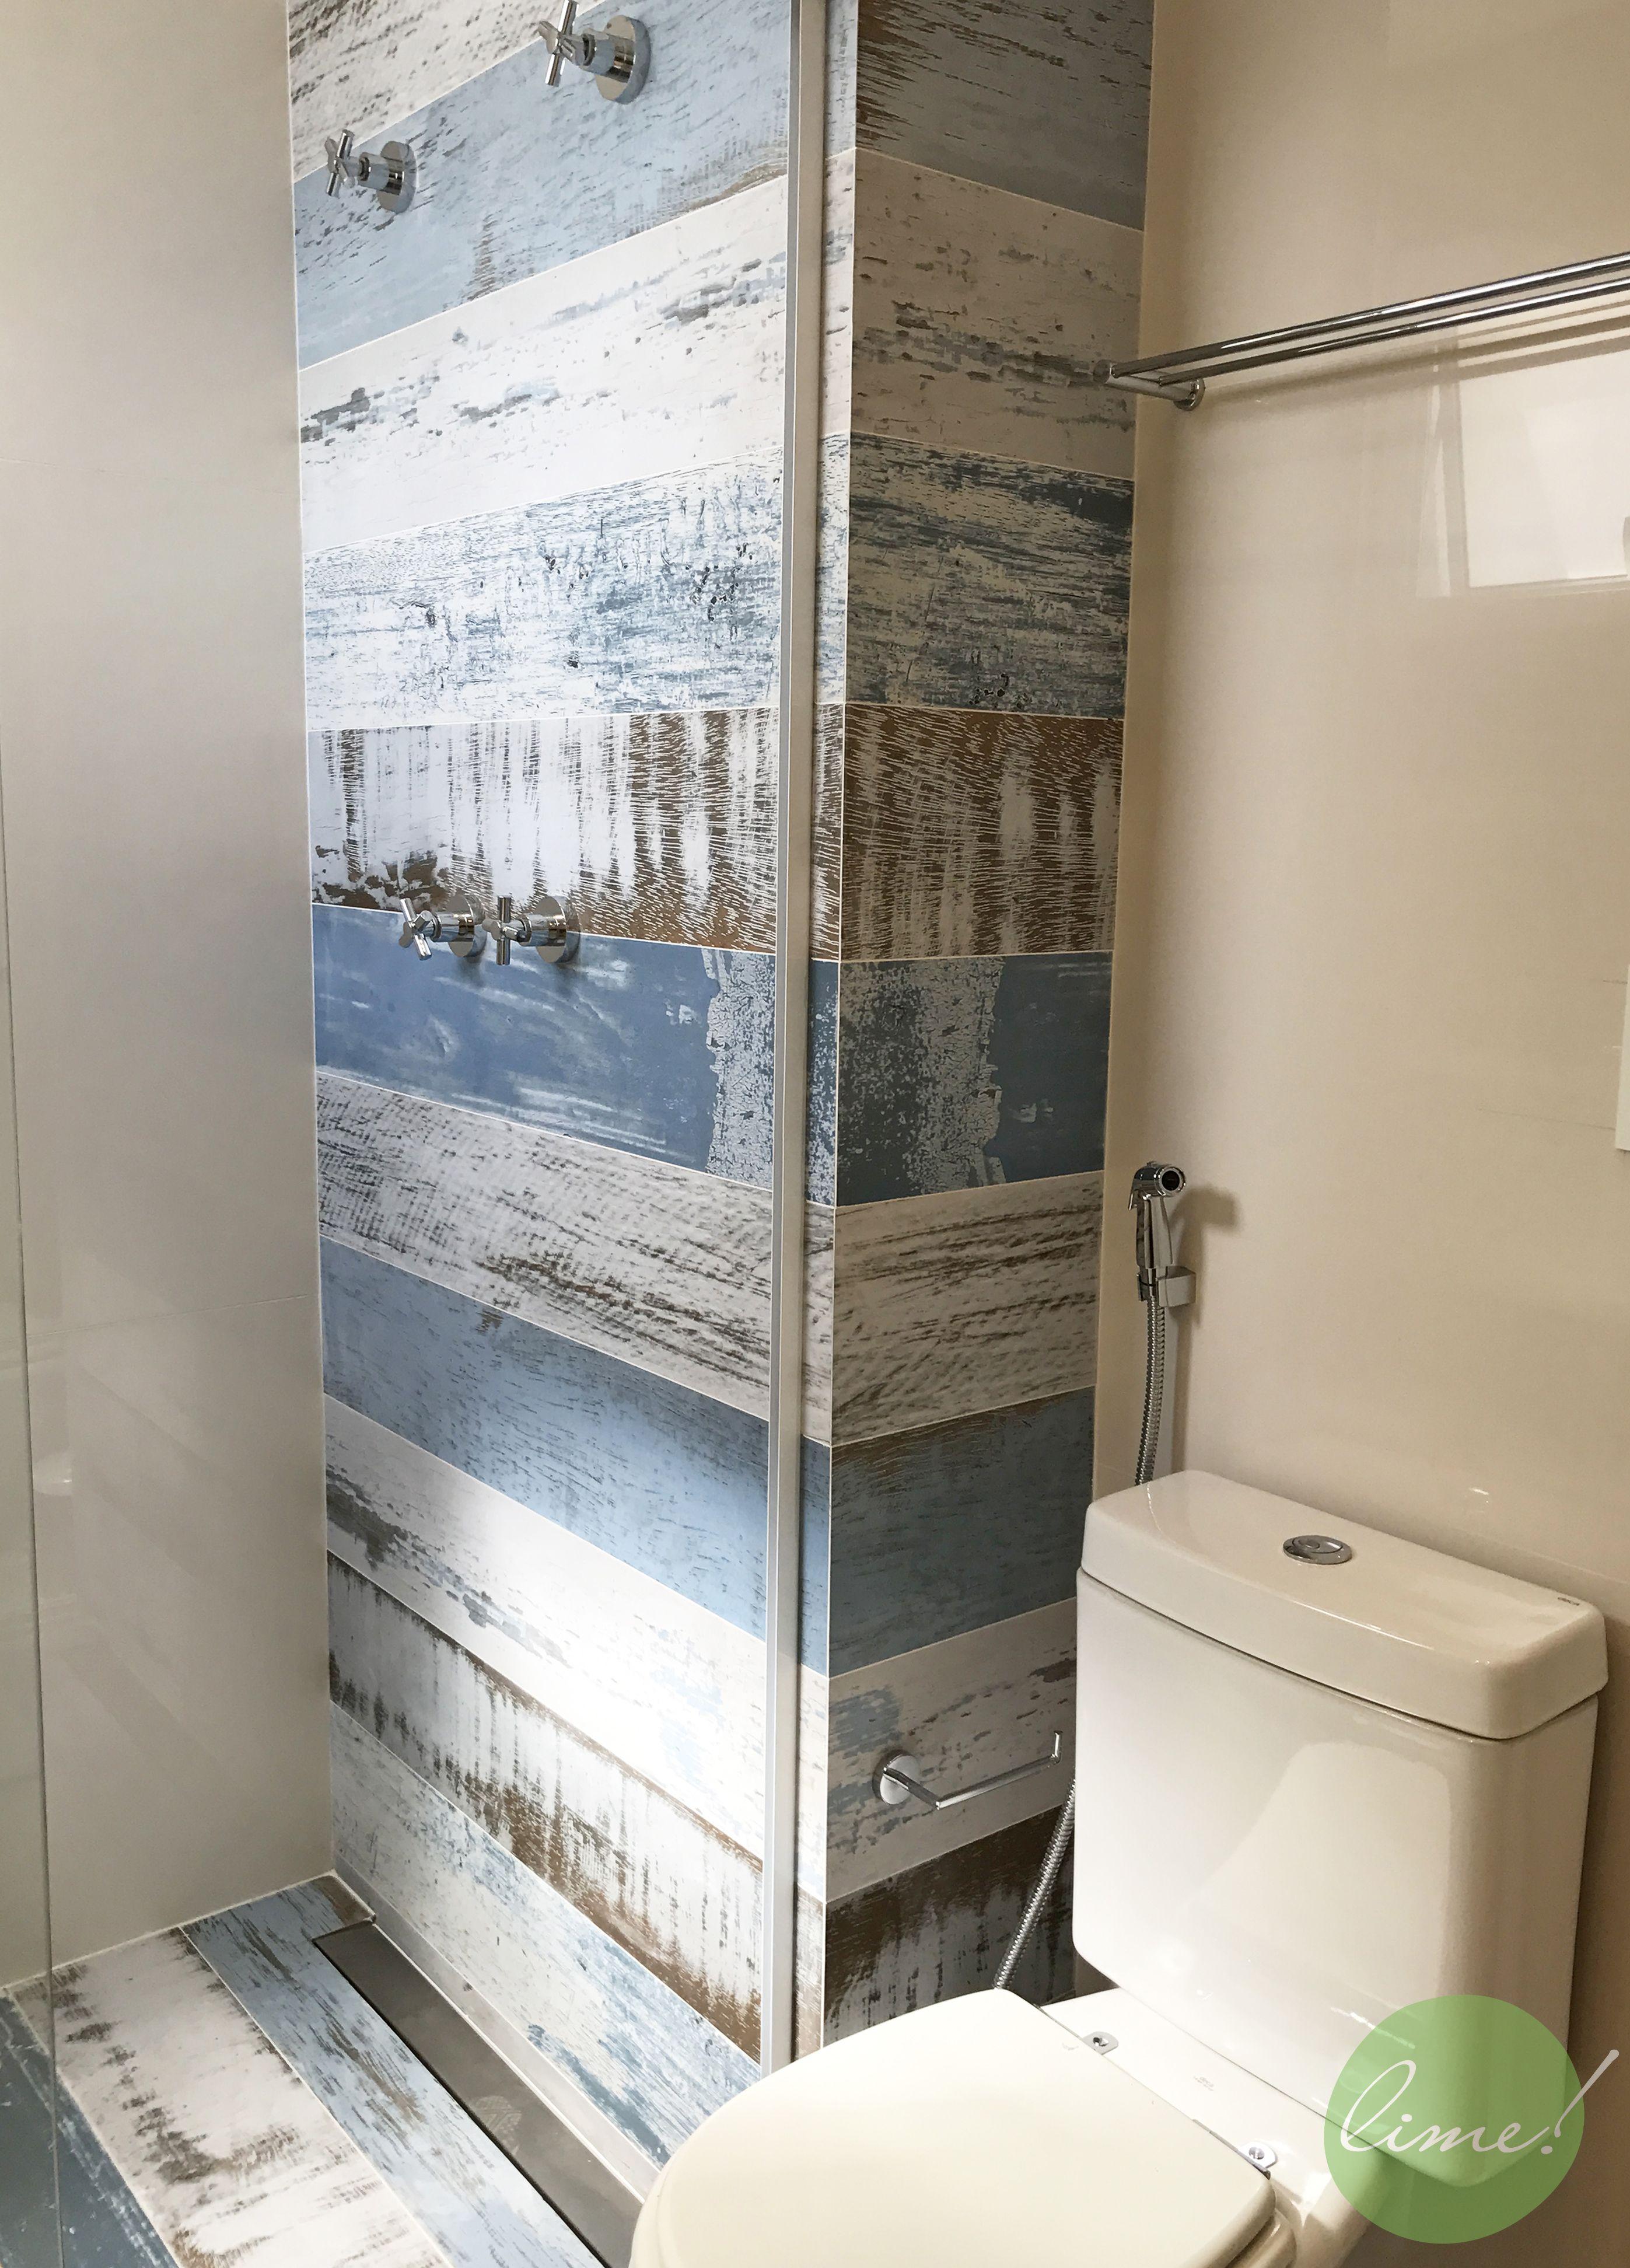 Banheiro Master O Revestimento Ecoville Da Decortiles é O Destaque